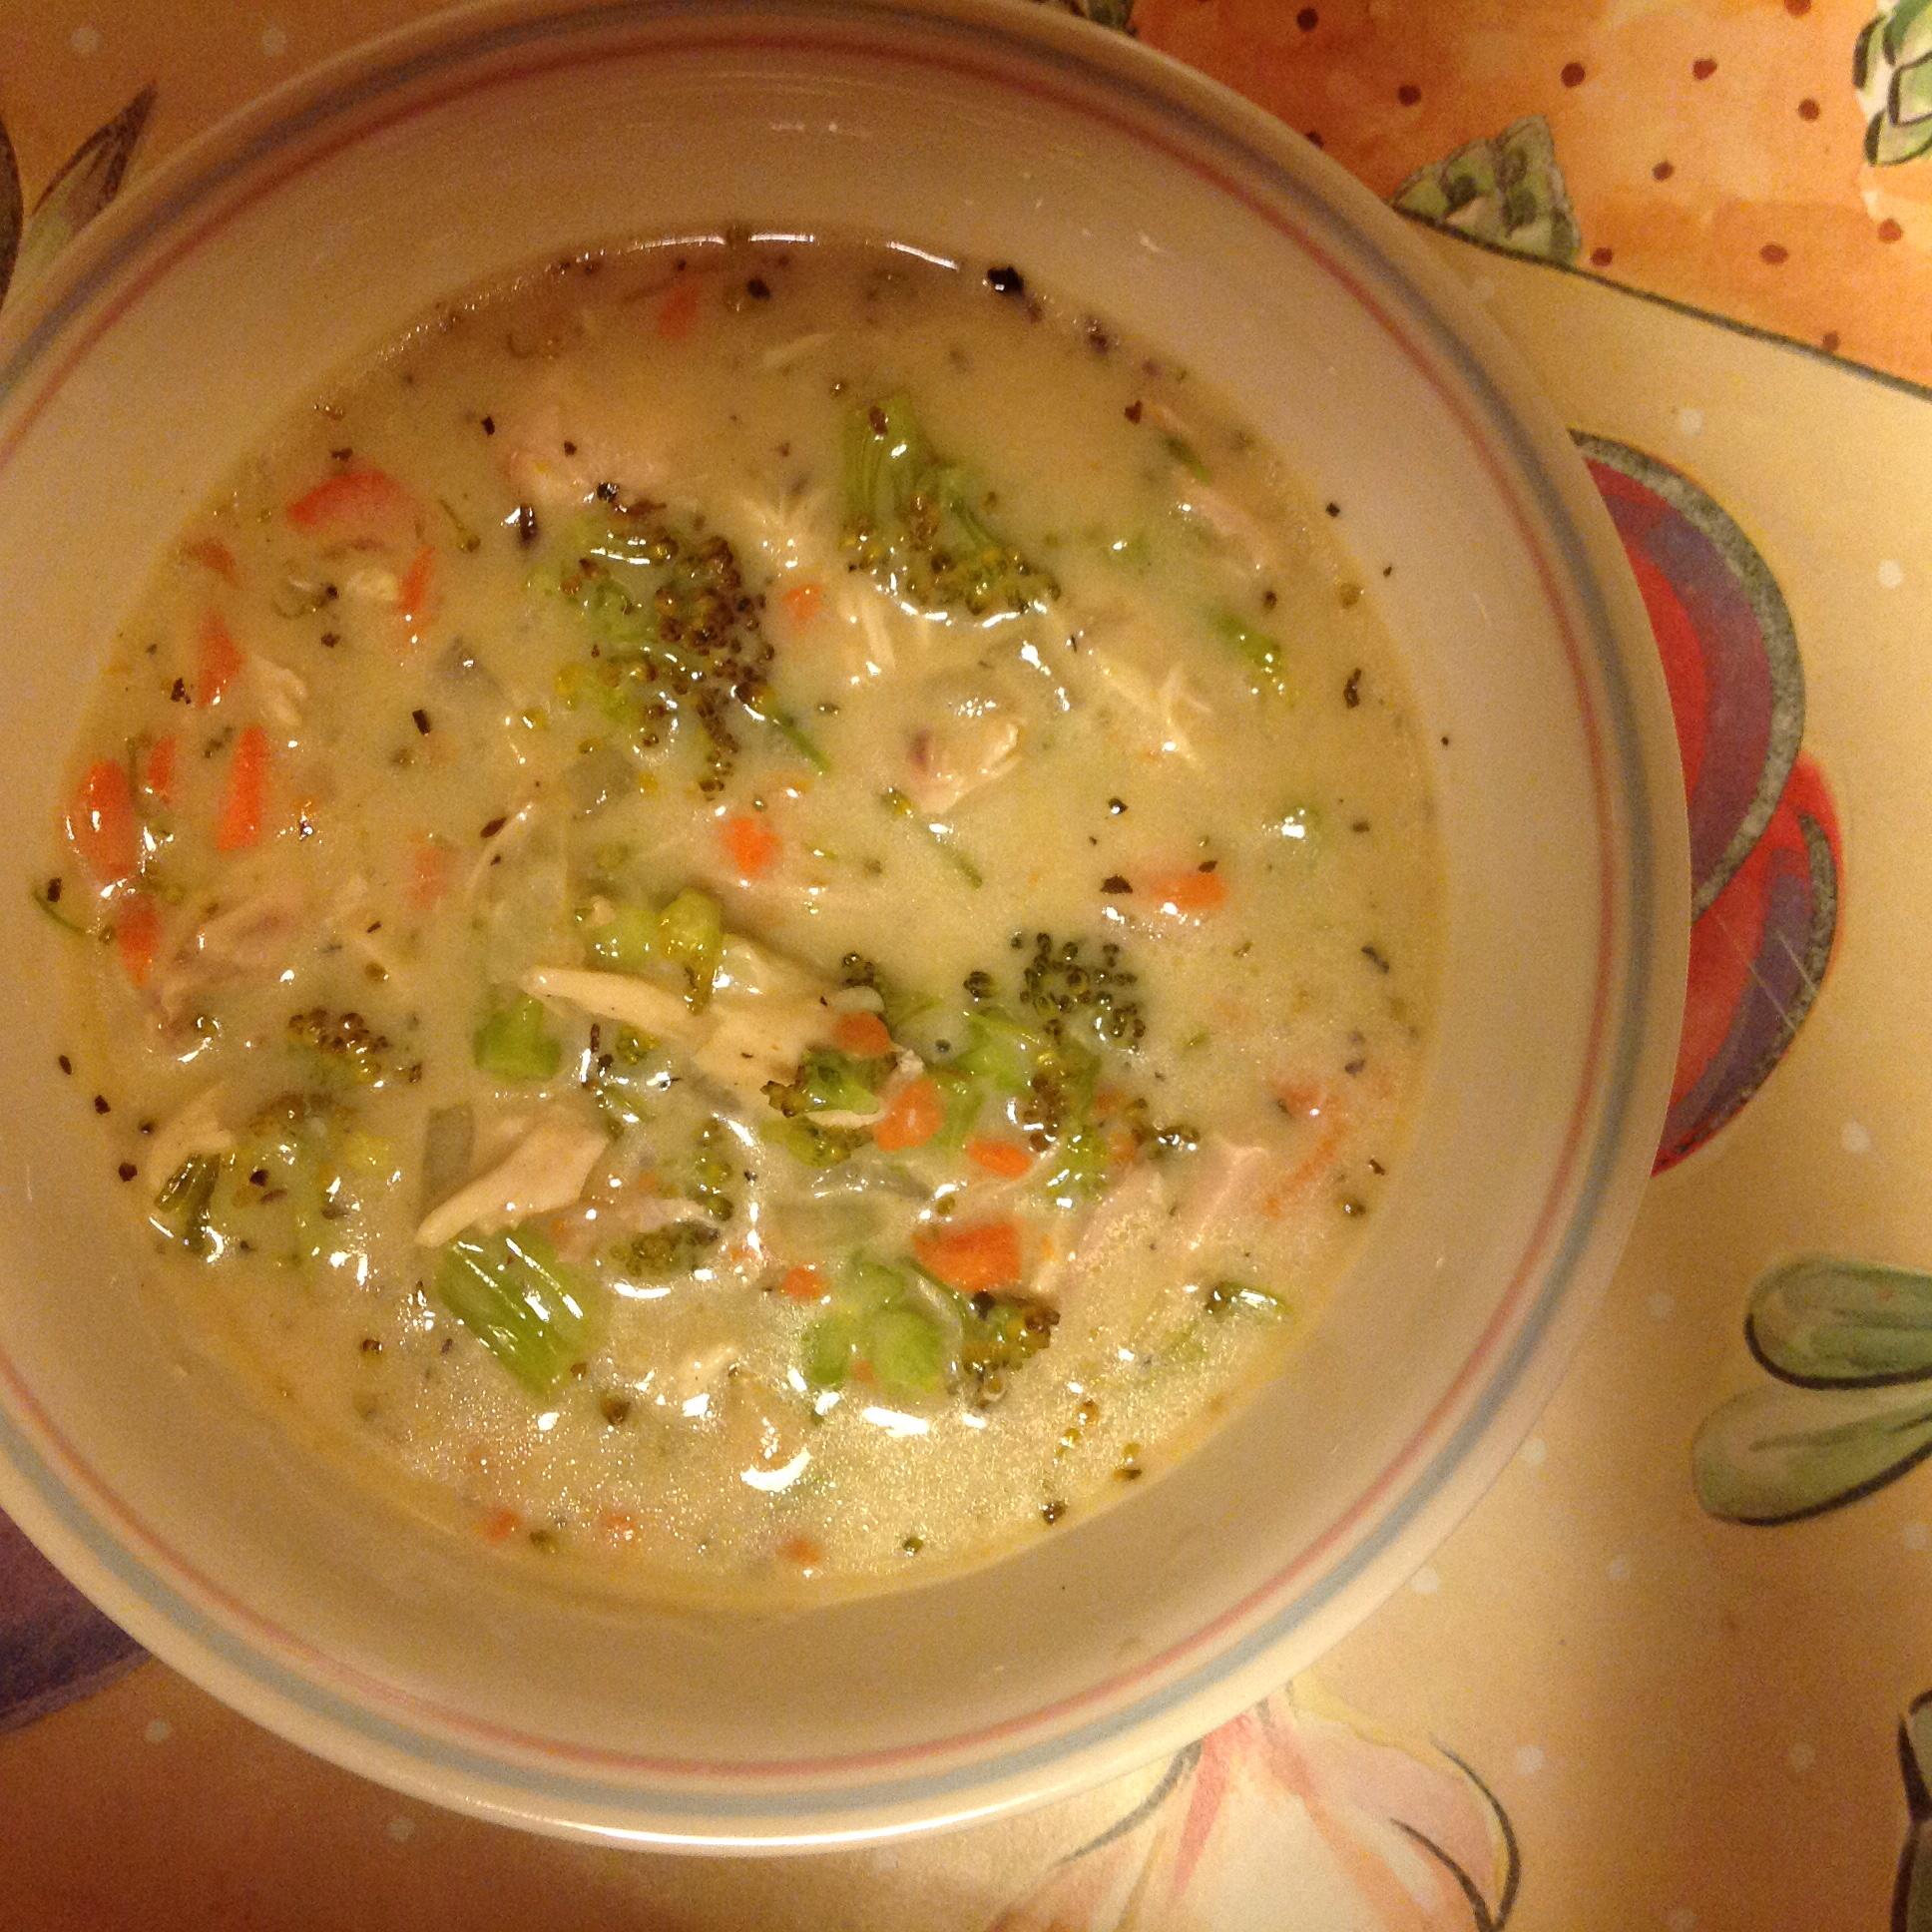 Creamy Broccoli-Chicken Soup Beverly